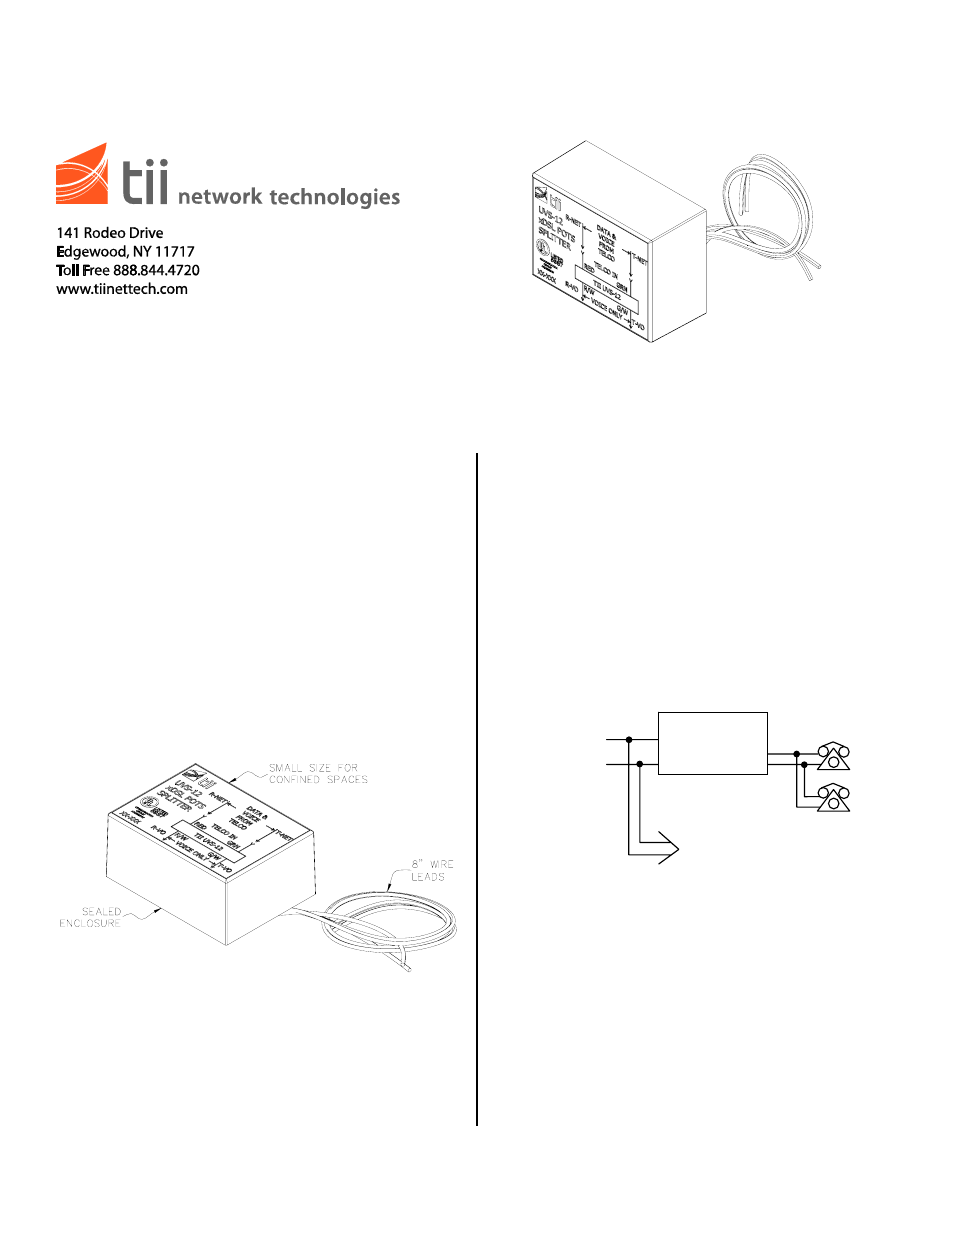 Tii Uvs 12 User Manual 1 Page 2 Line Phone Telephone Splitter Wiring Diagram